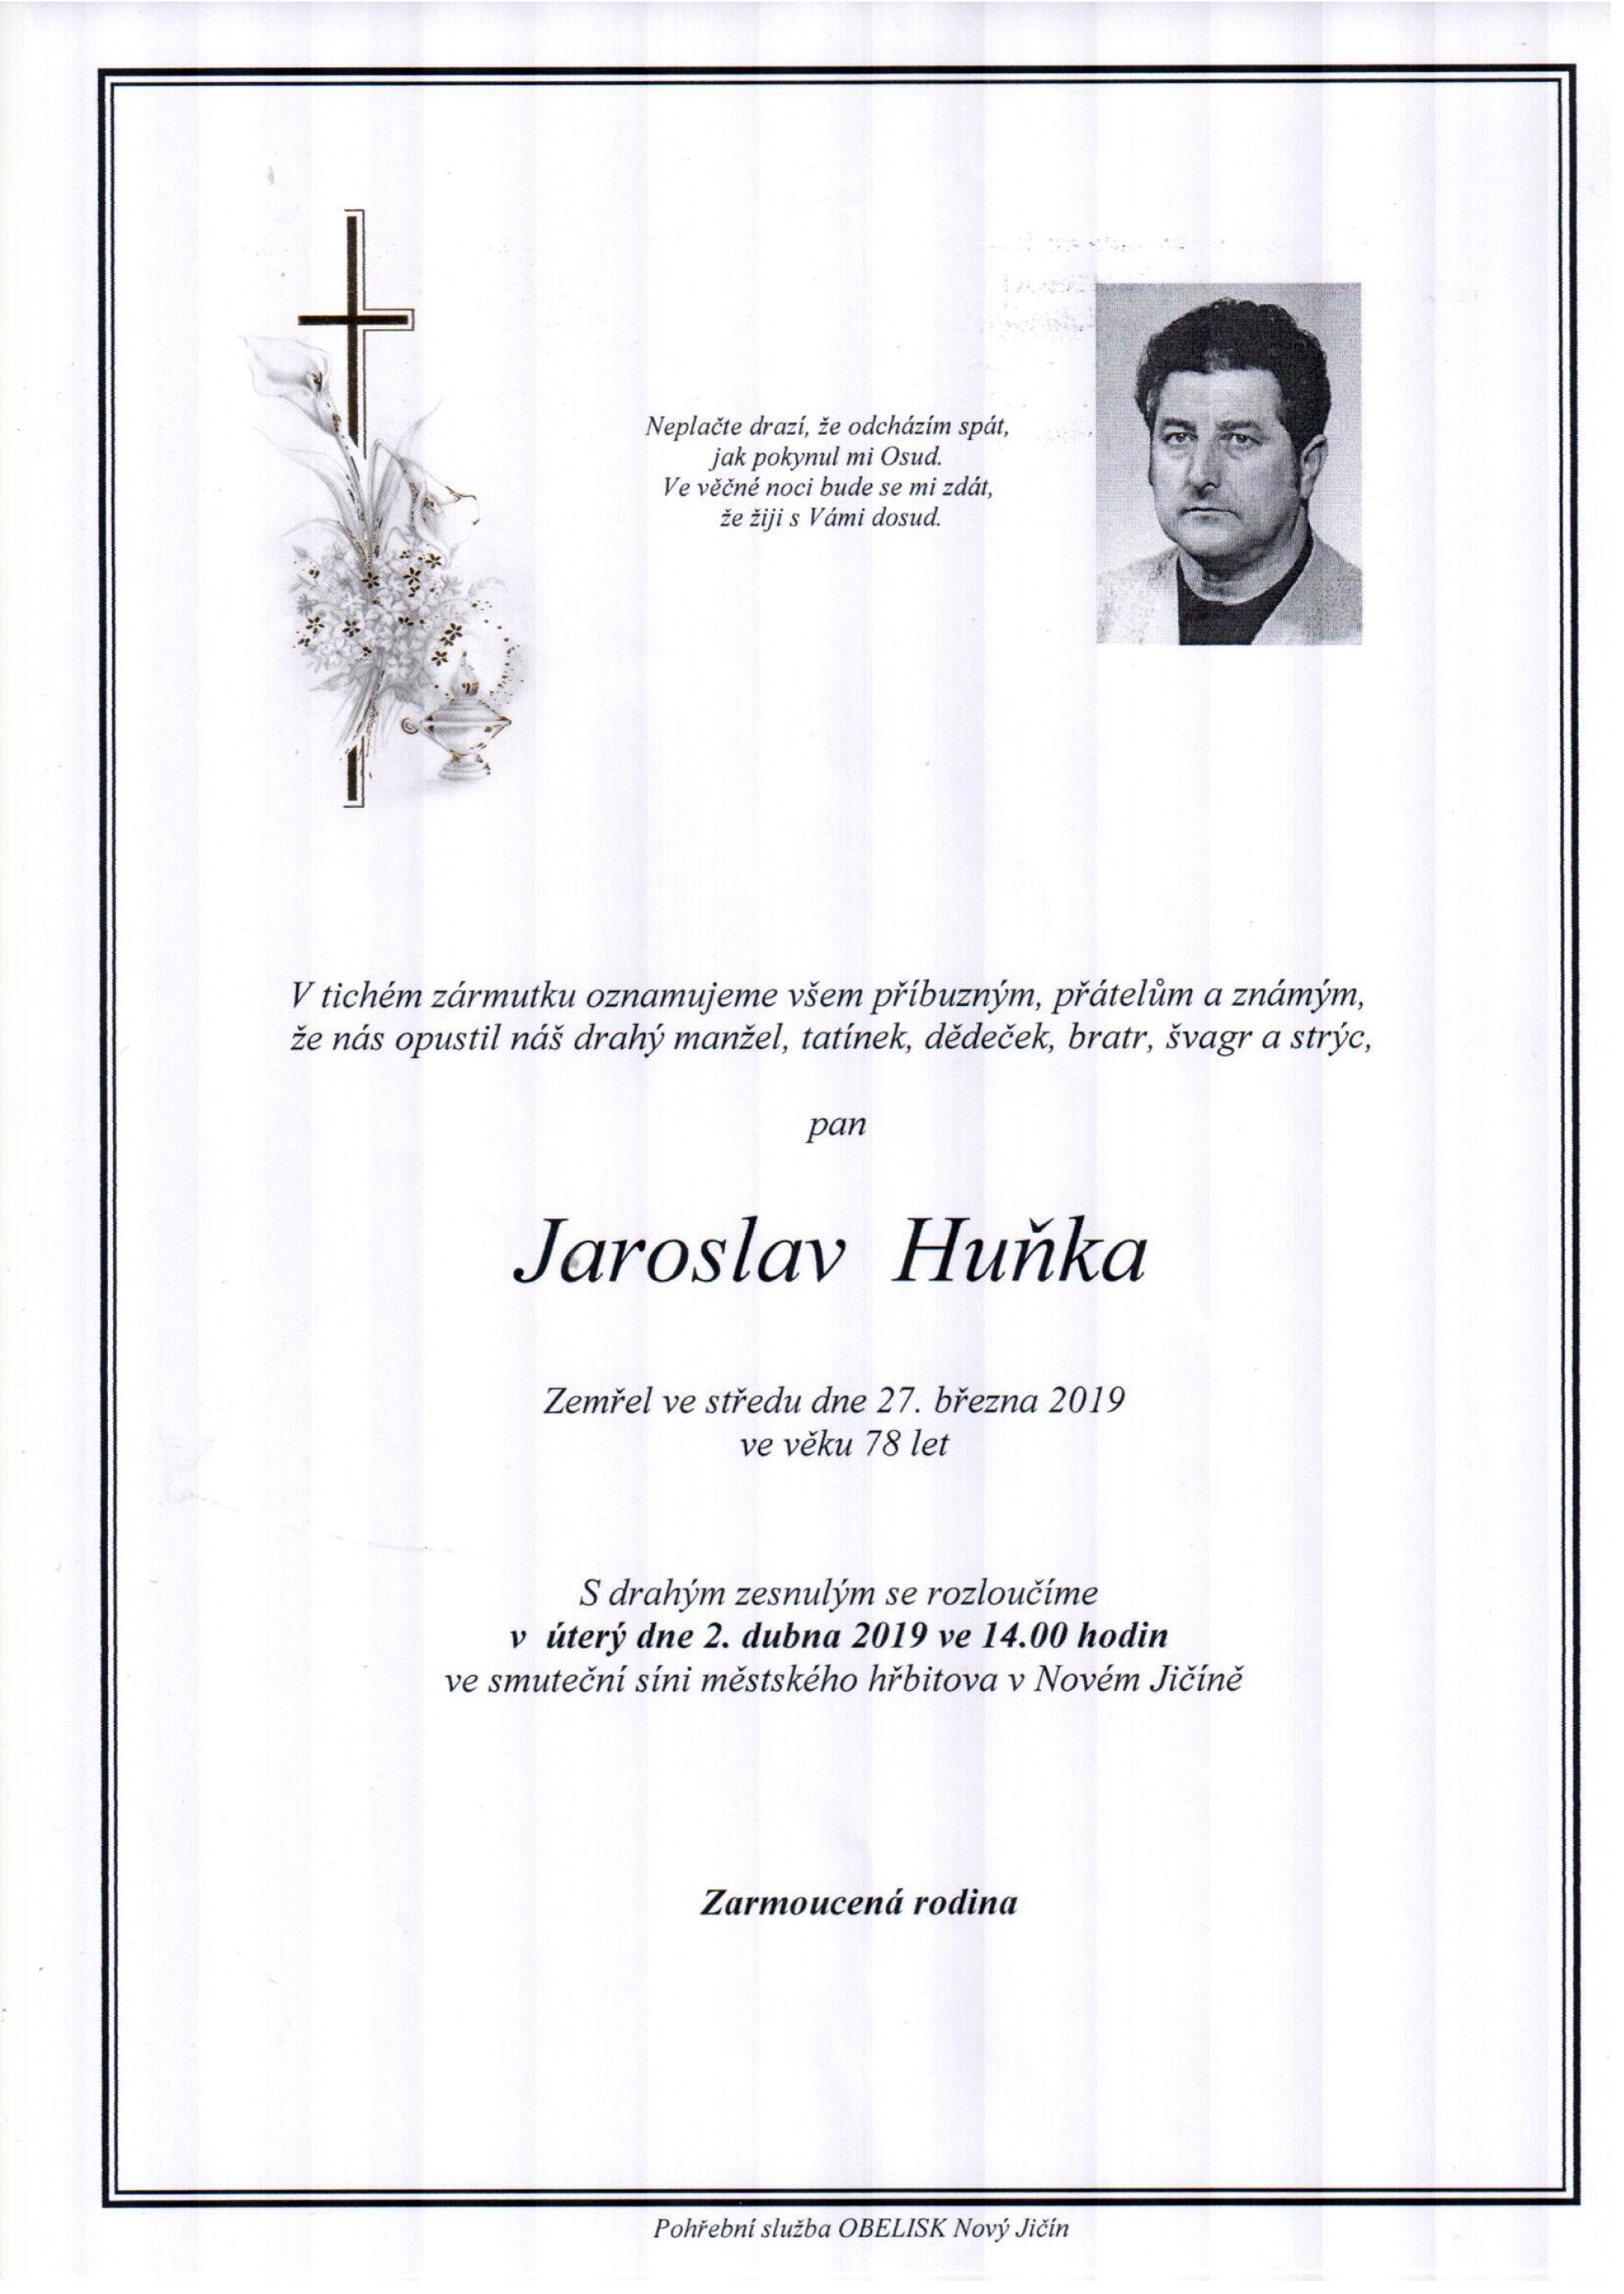 Jaroslav Huňka